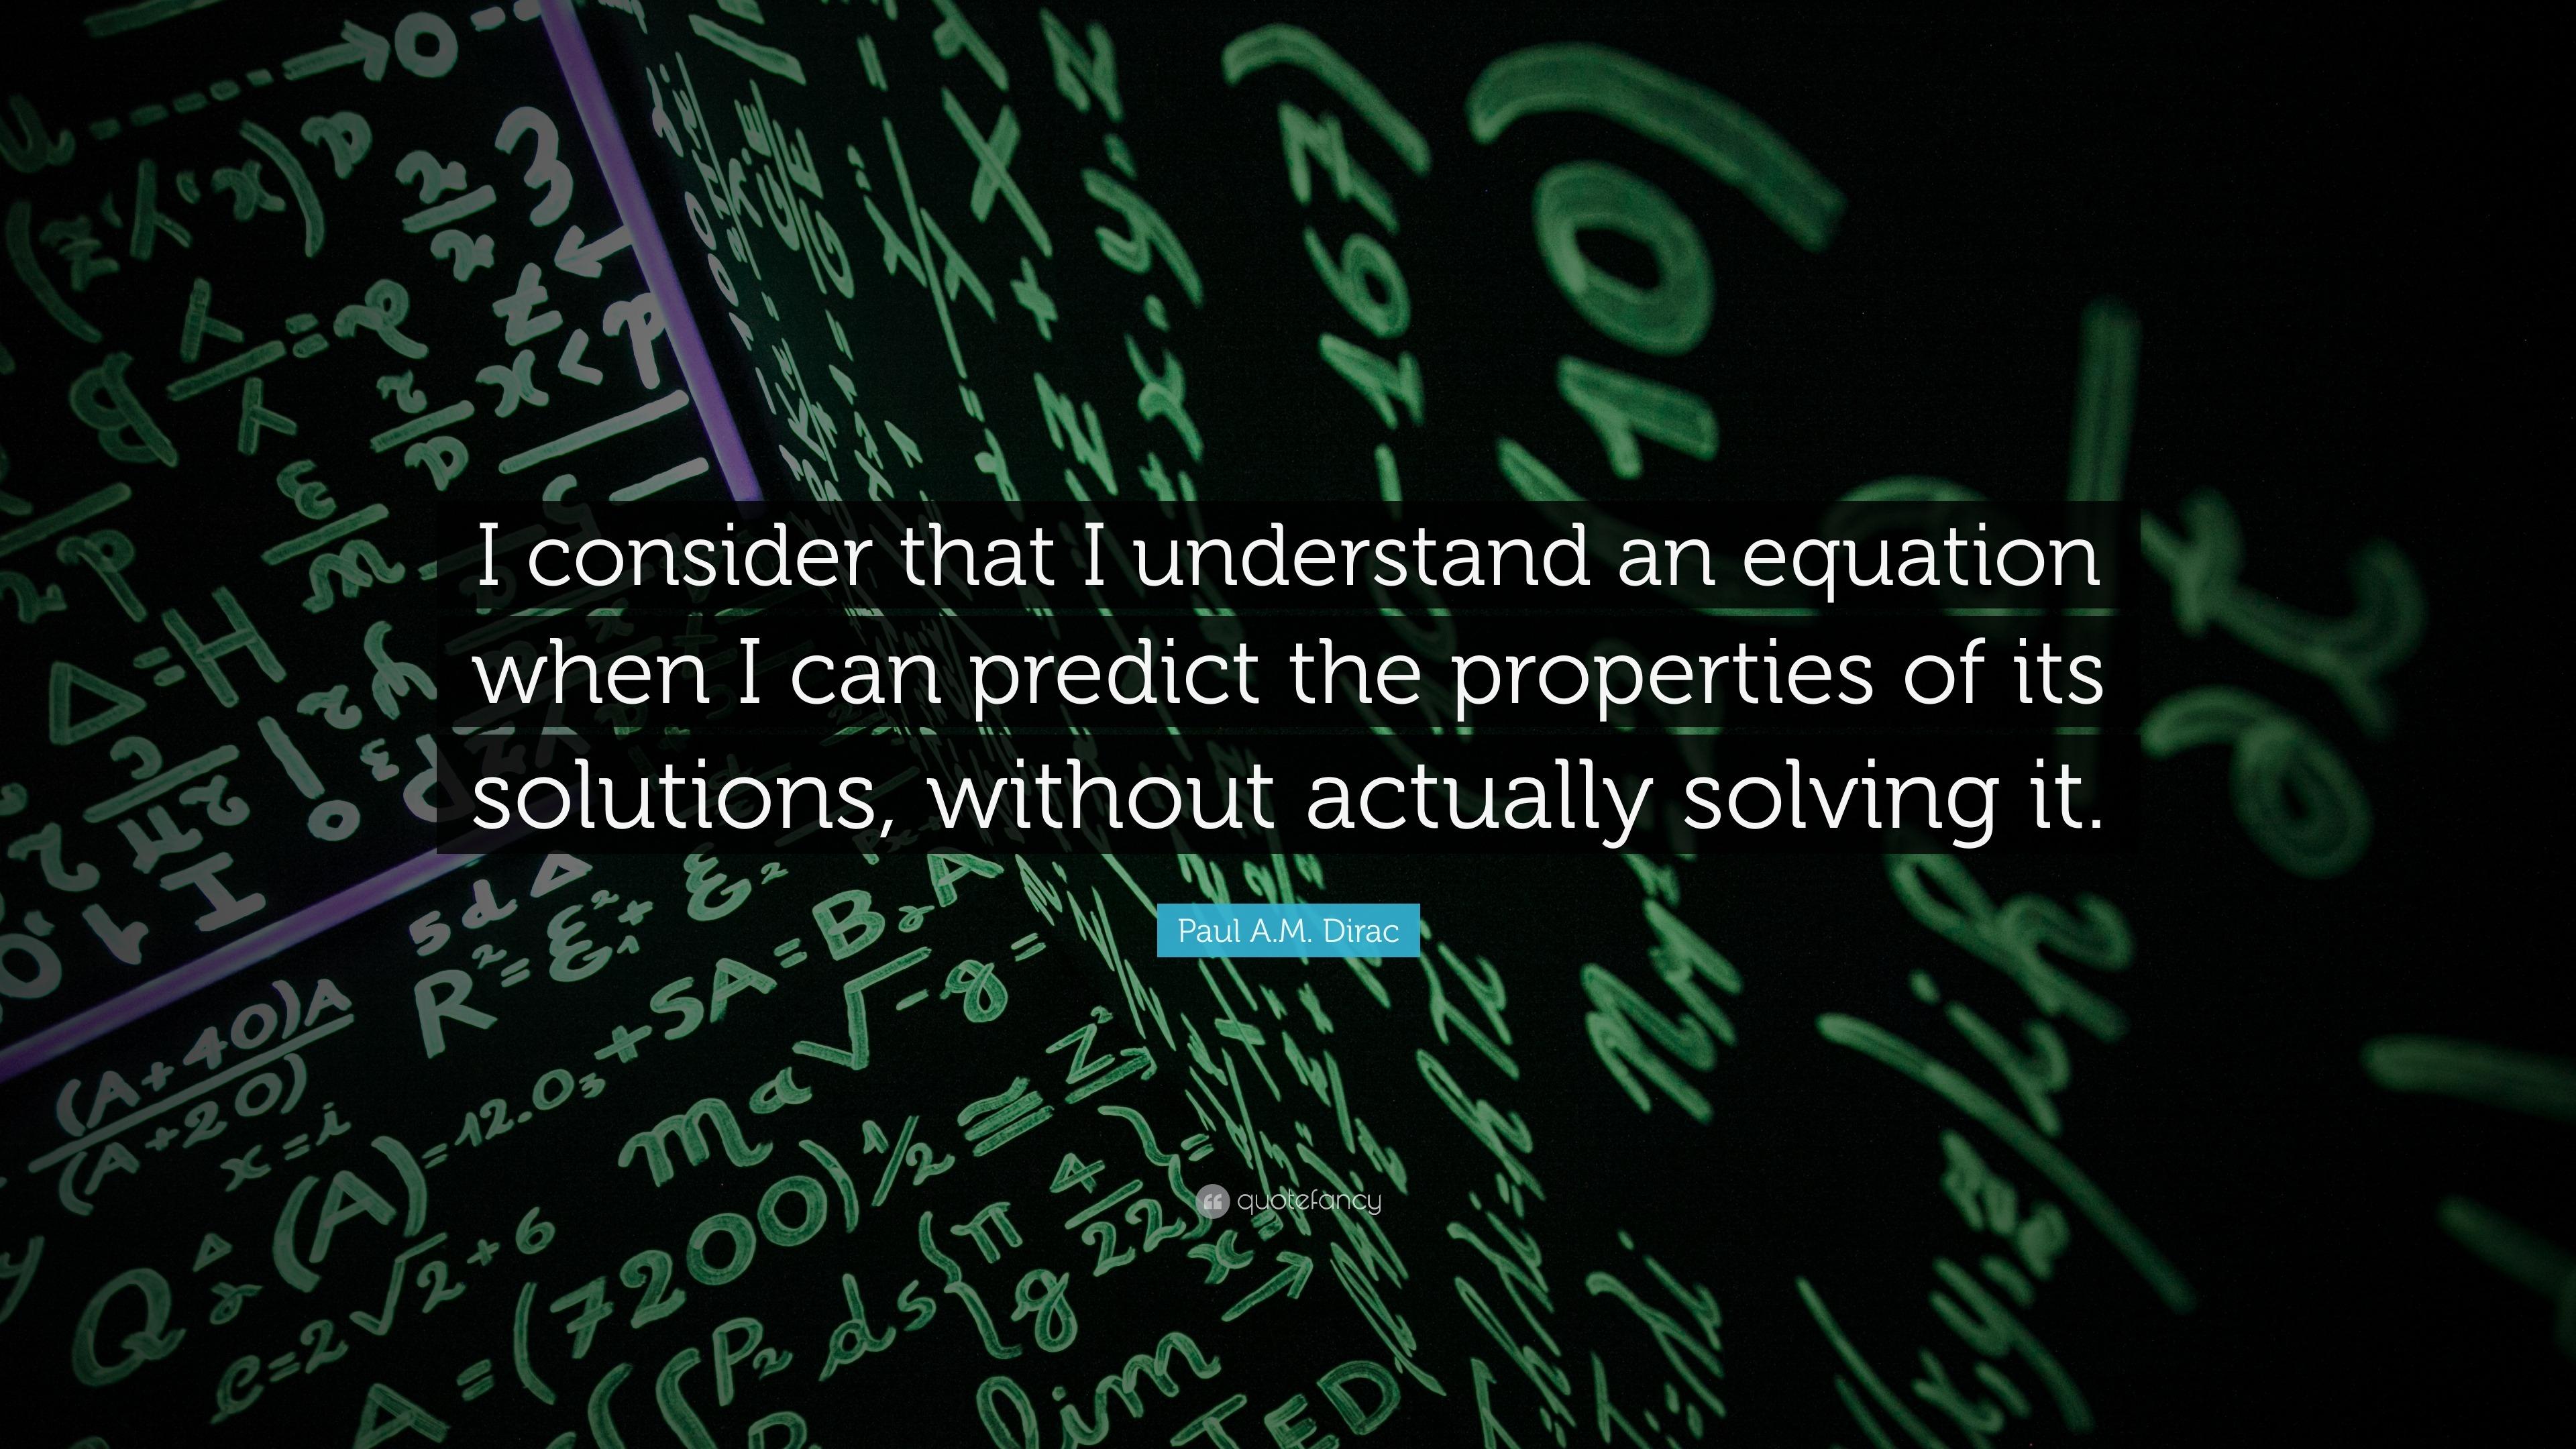 Paul A M  Dirac Quotes (31 wallpapers) - Quotefancy